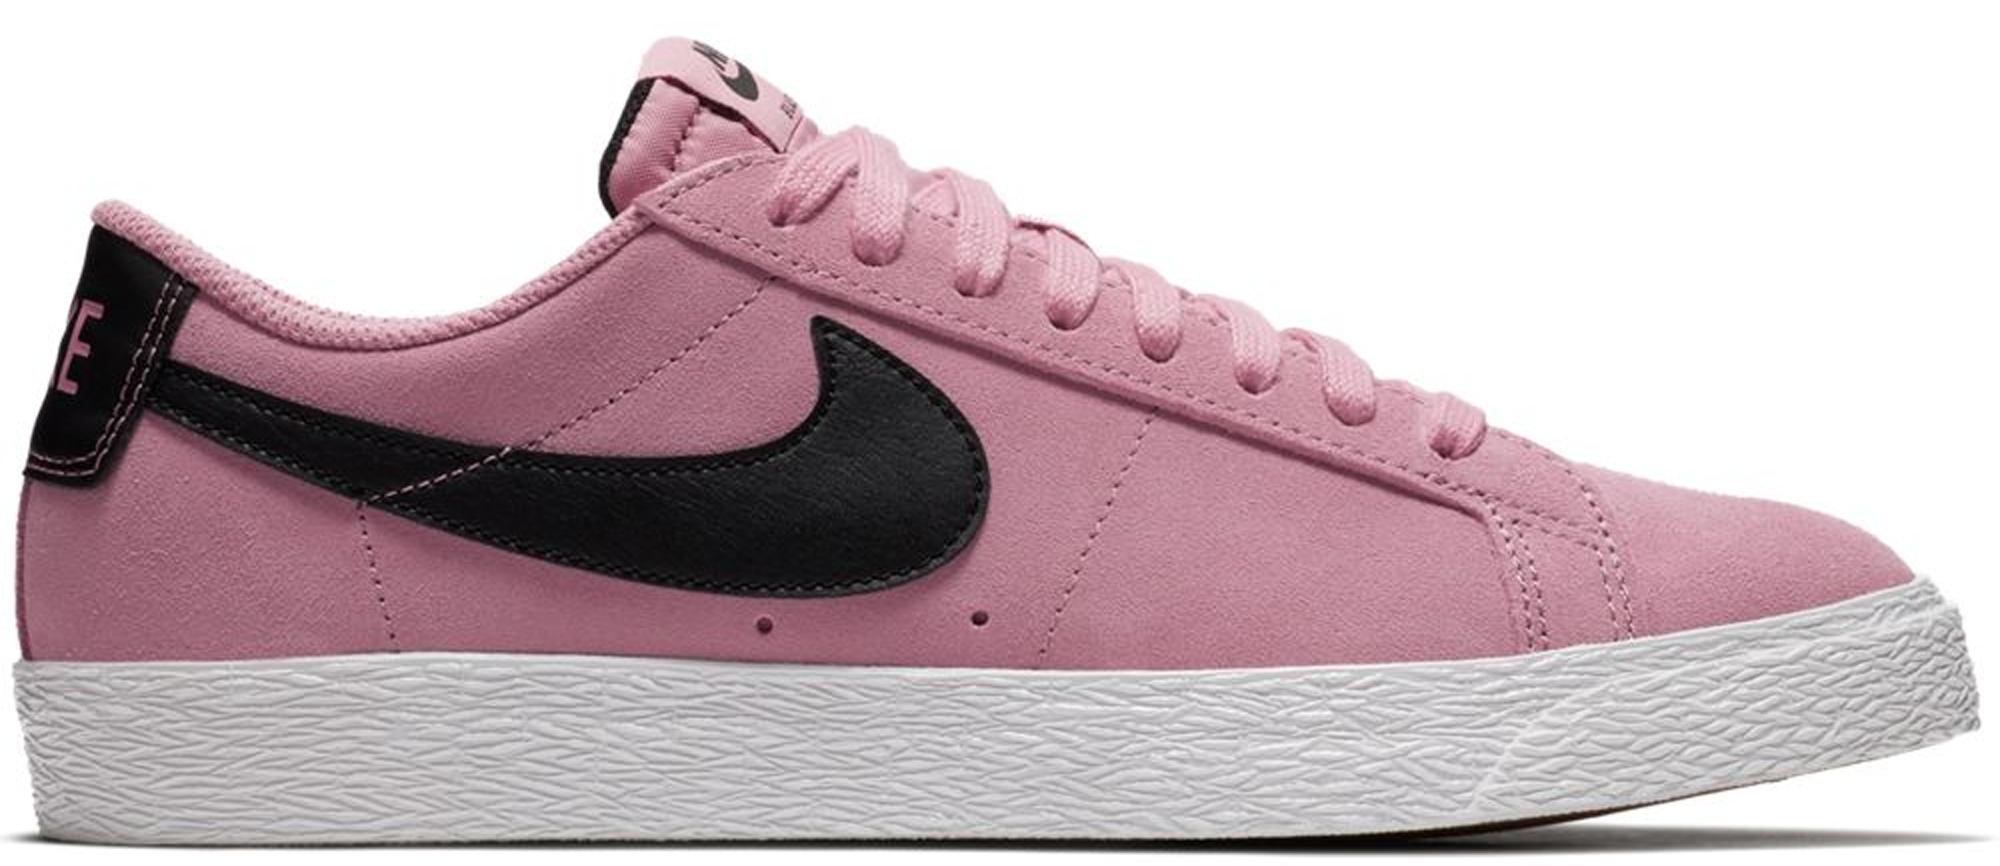 Nike SB Zoom Blazer Low Elemental Pink